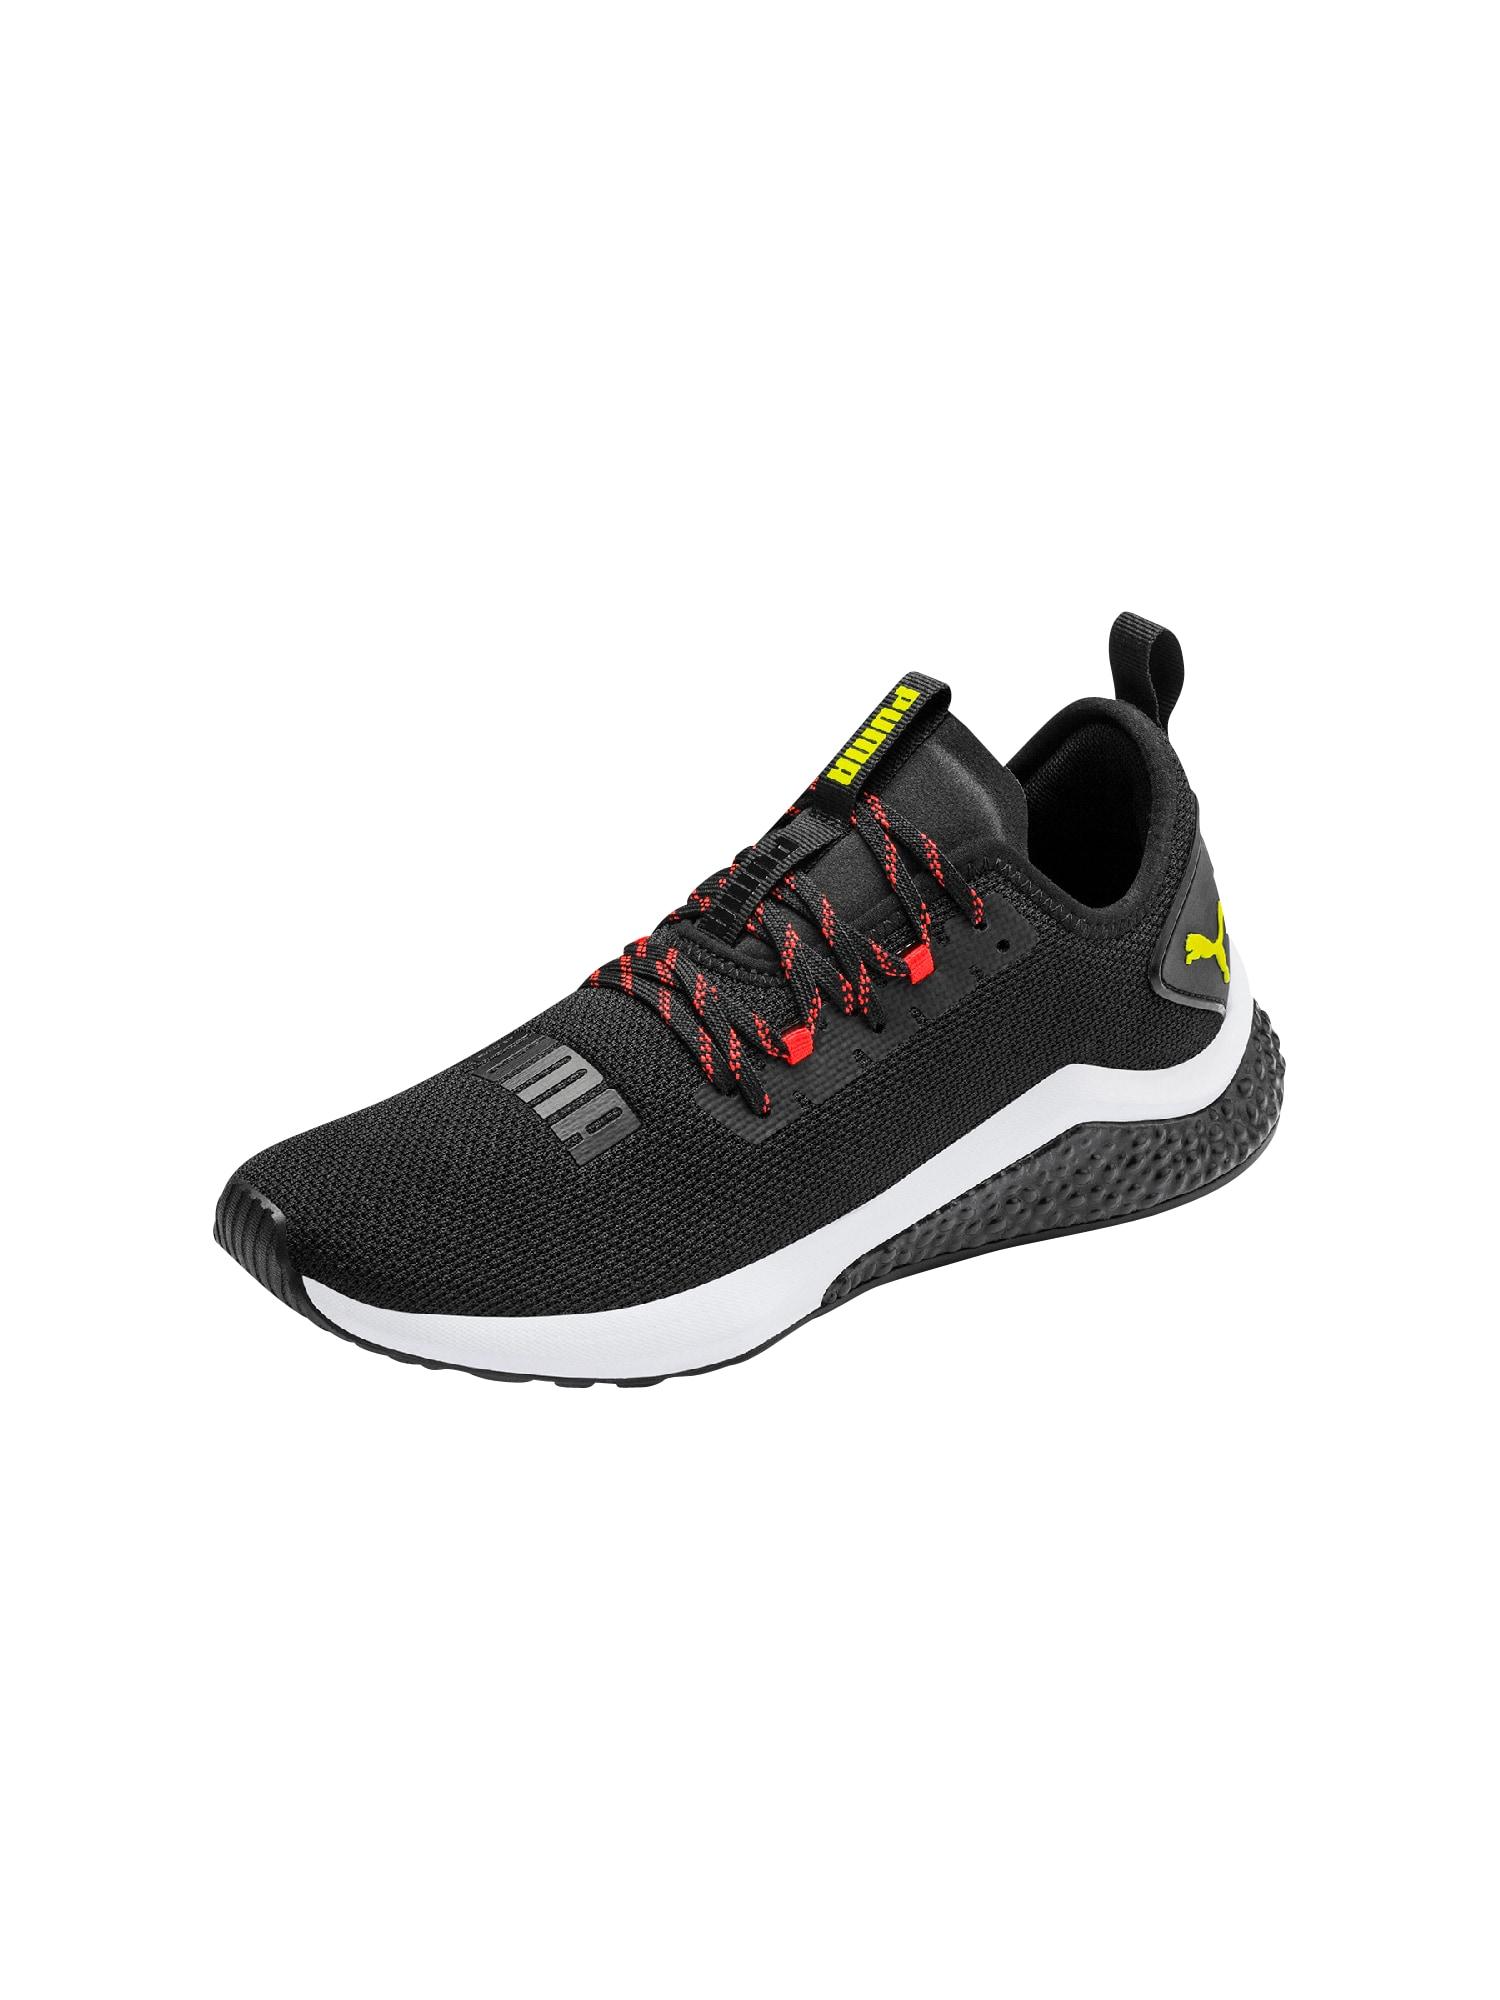 Běžecká obuv černá PUMA